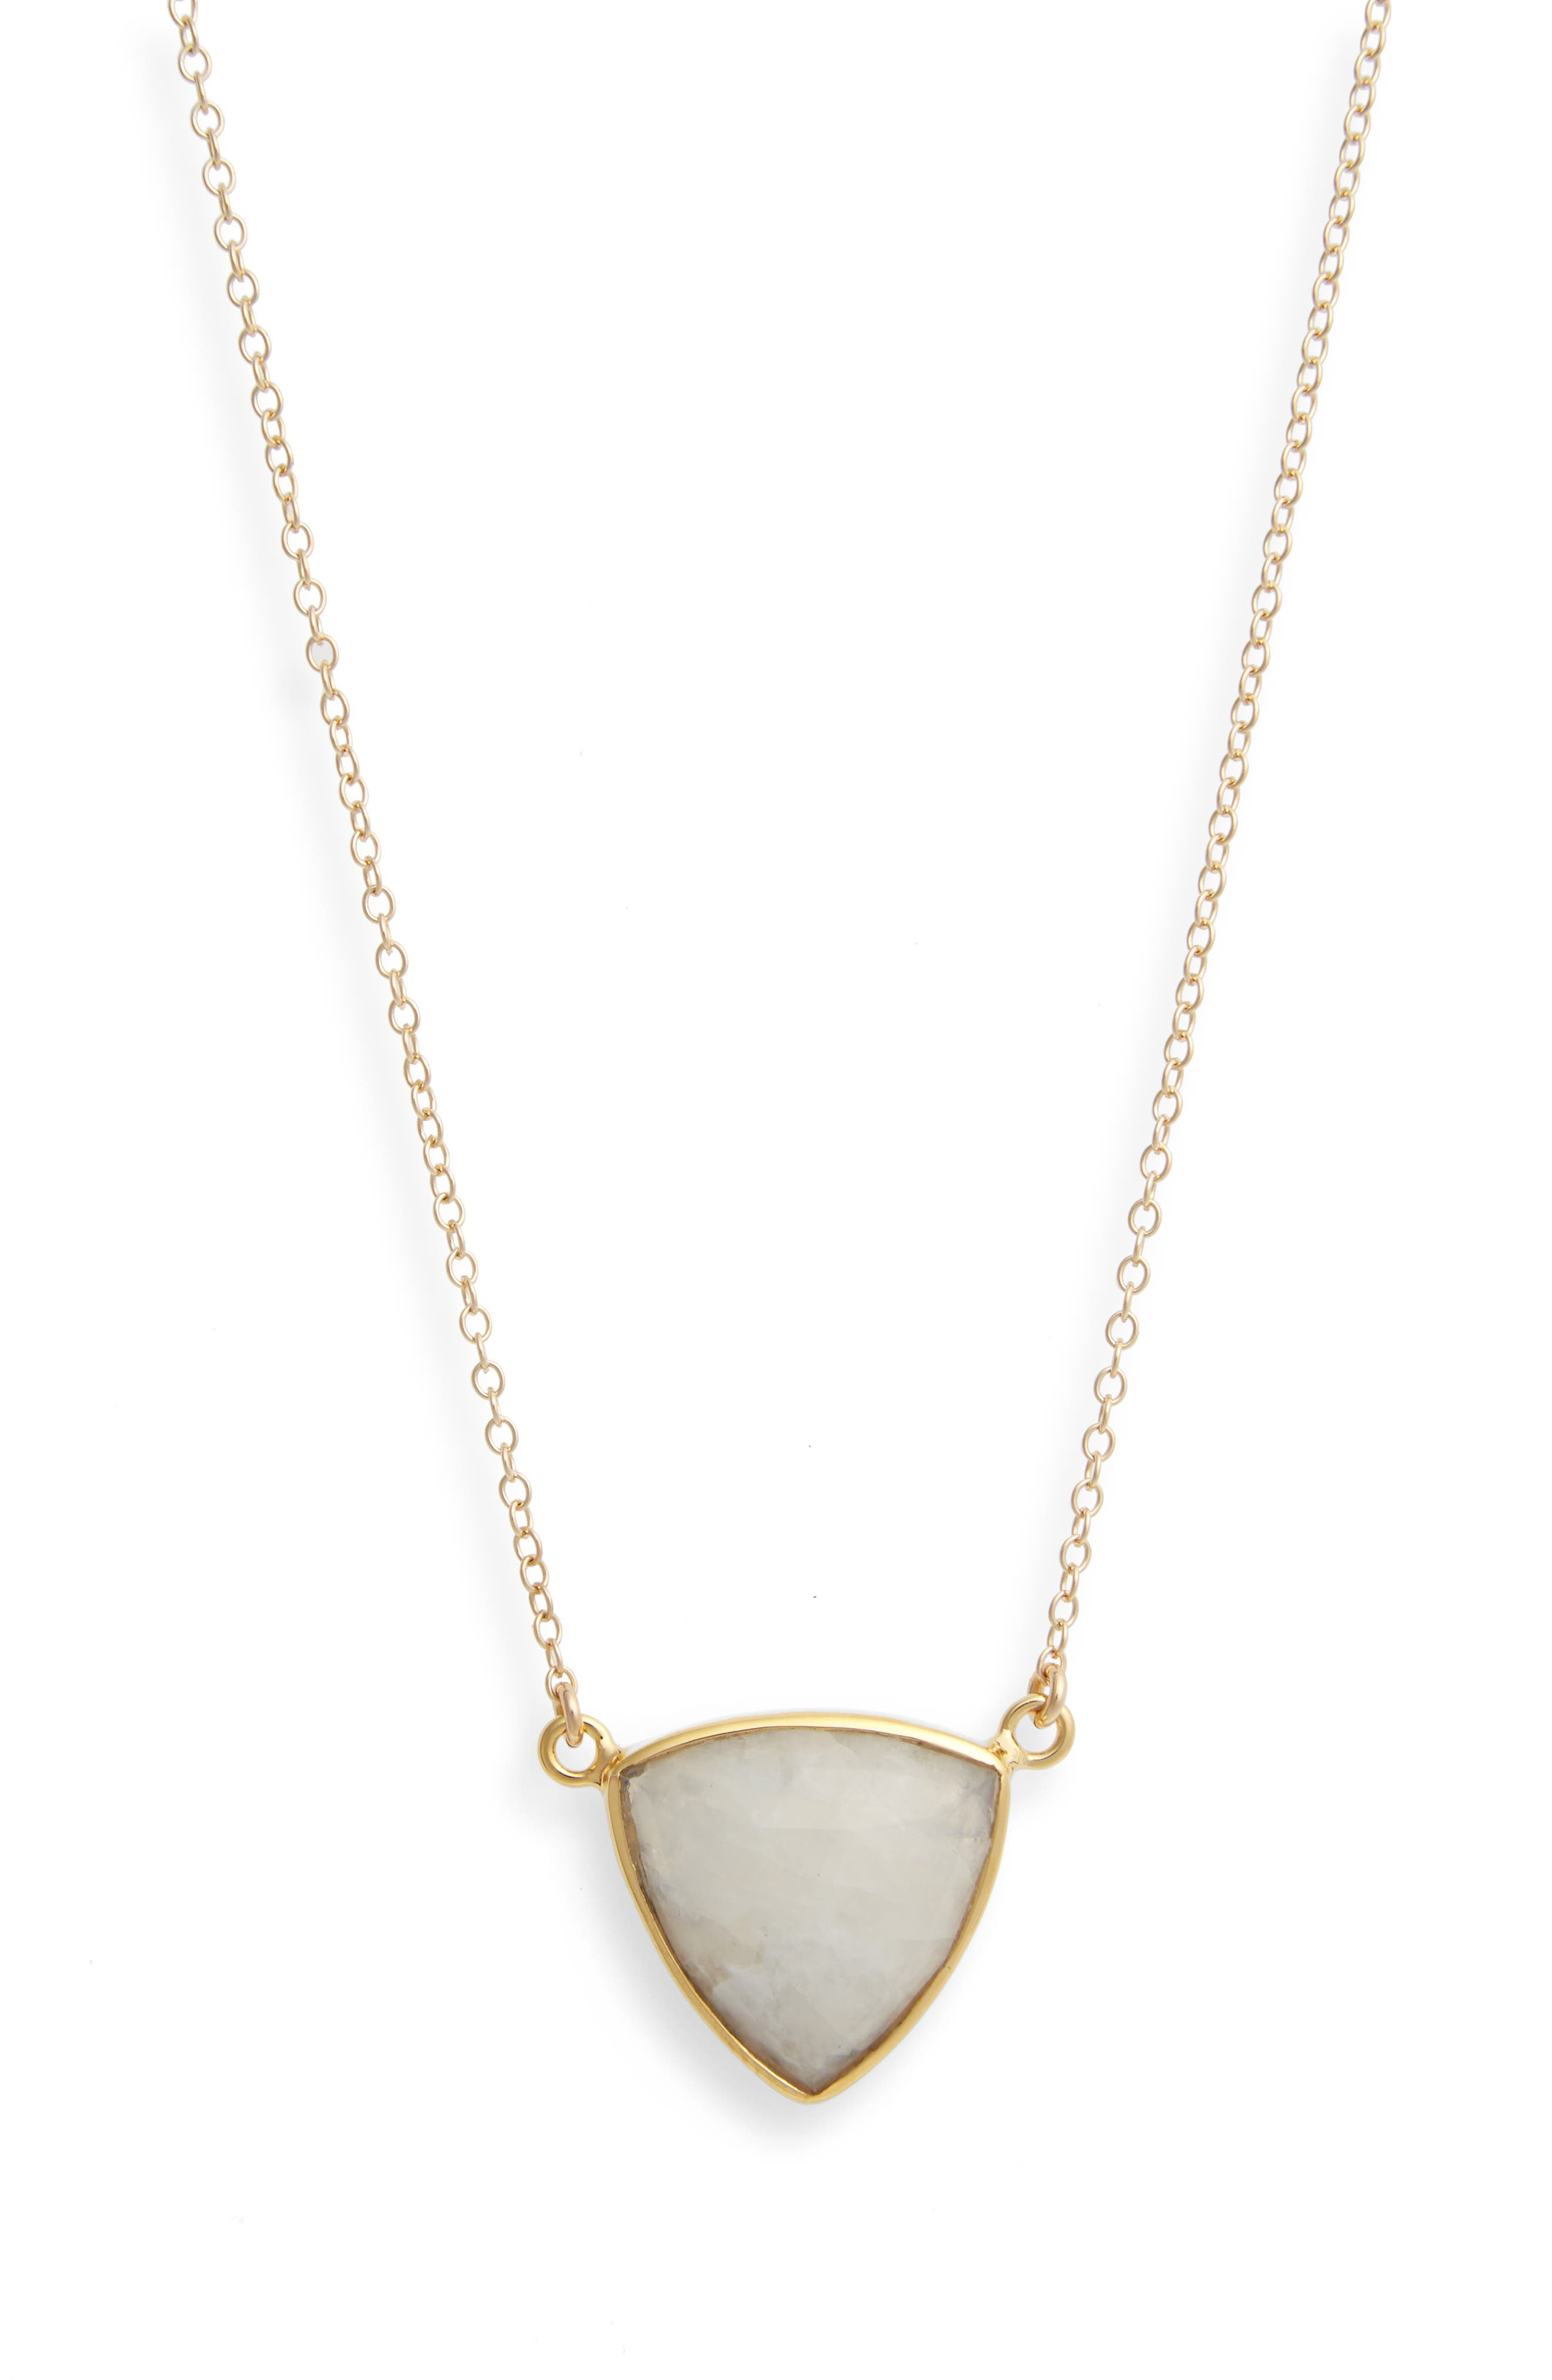 Main Image - Leah Alexandra Trillium Pendant Necklace